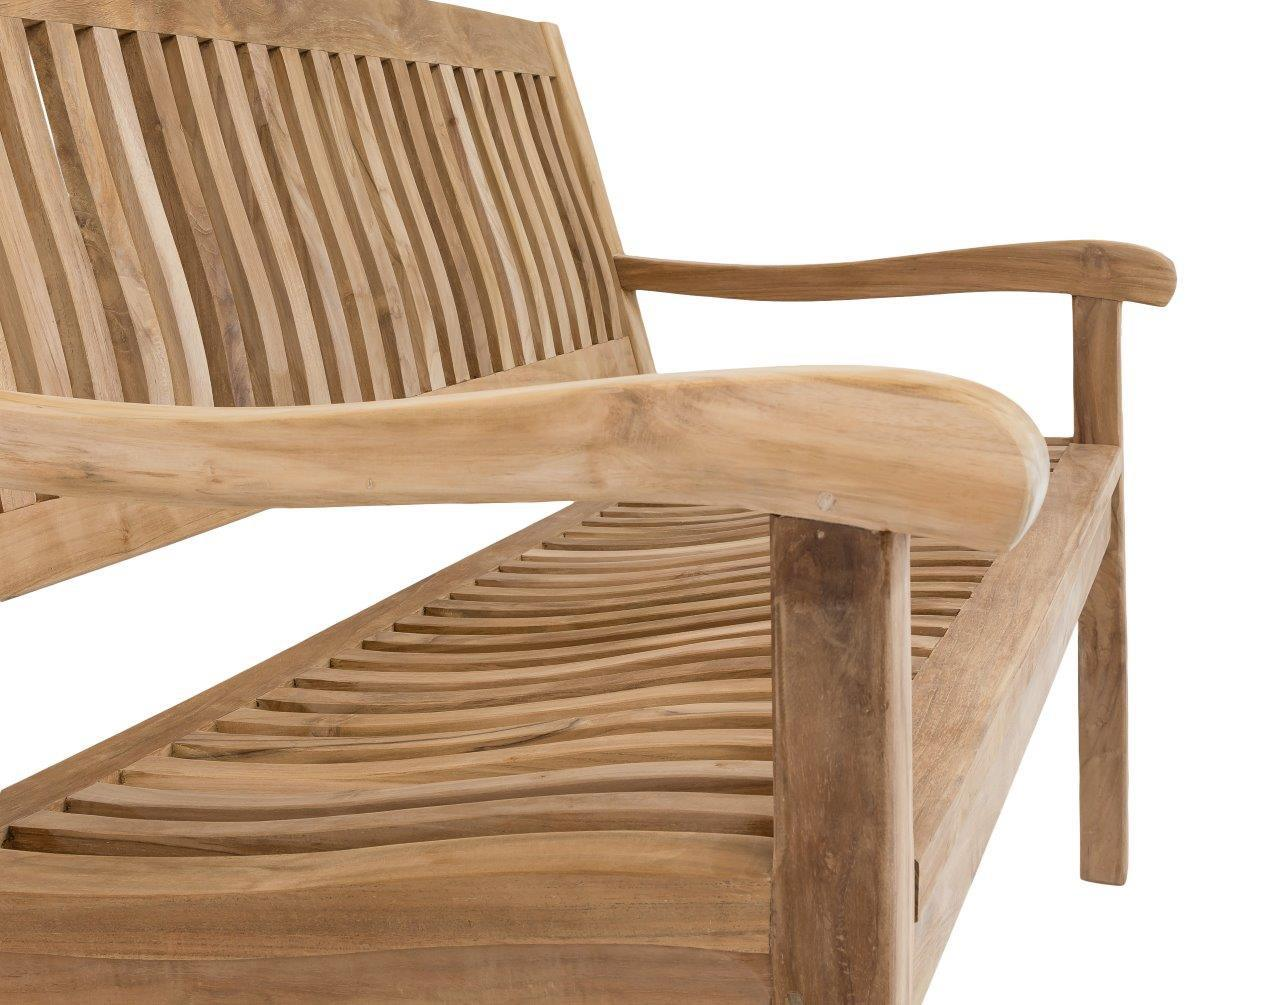 stabile 2 sitzer gartenbank kingsbury in premium teak 120 cm. Black Bedroom Furniture Sets. Home Design Ideas